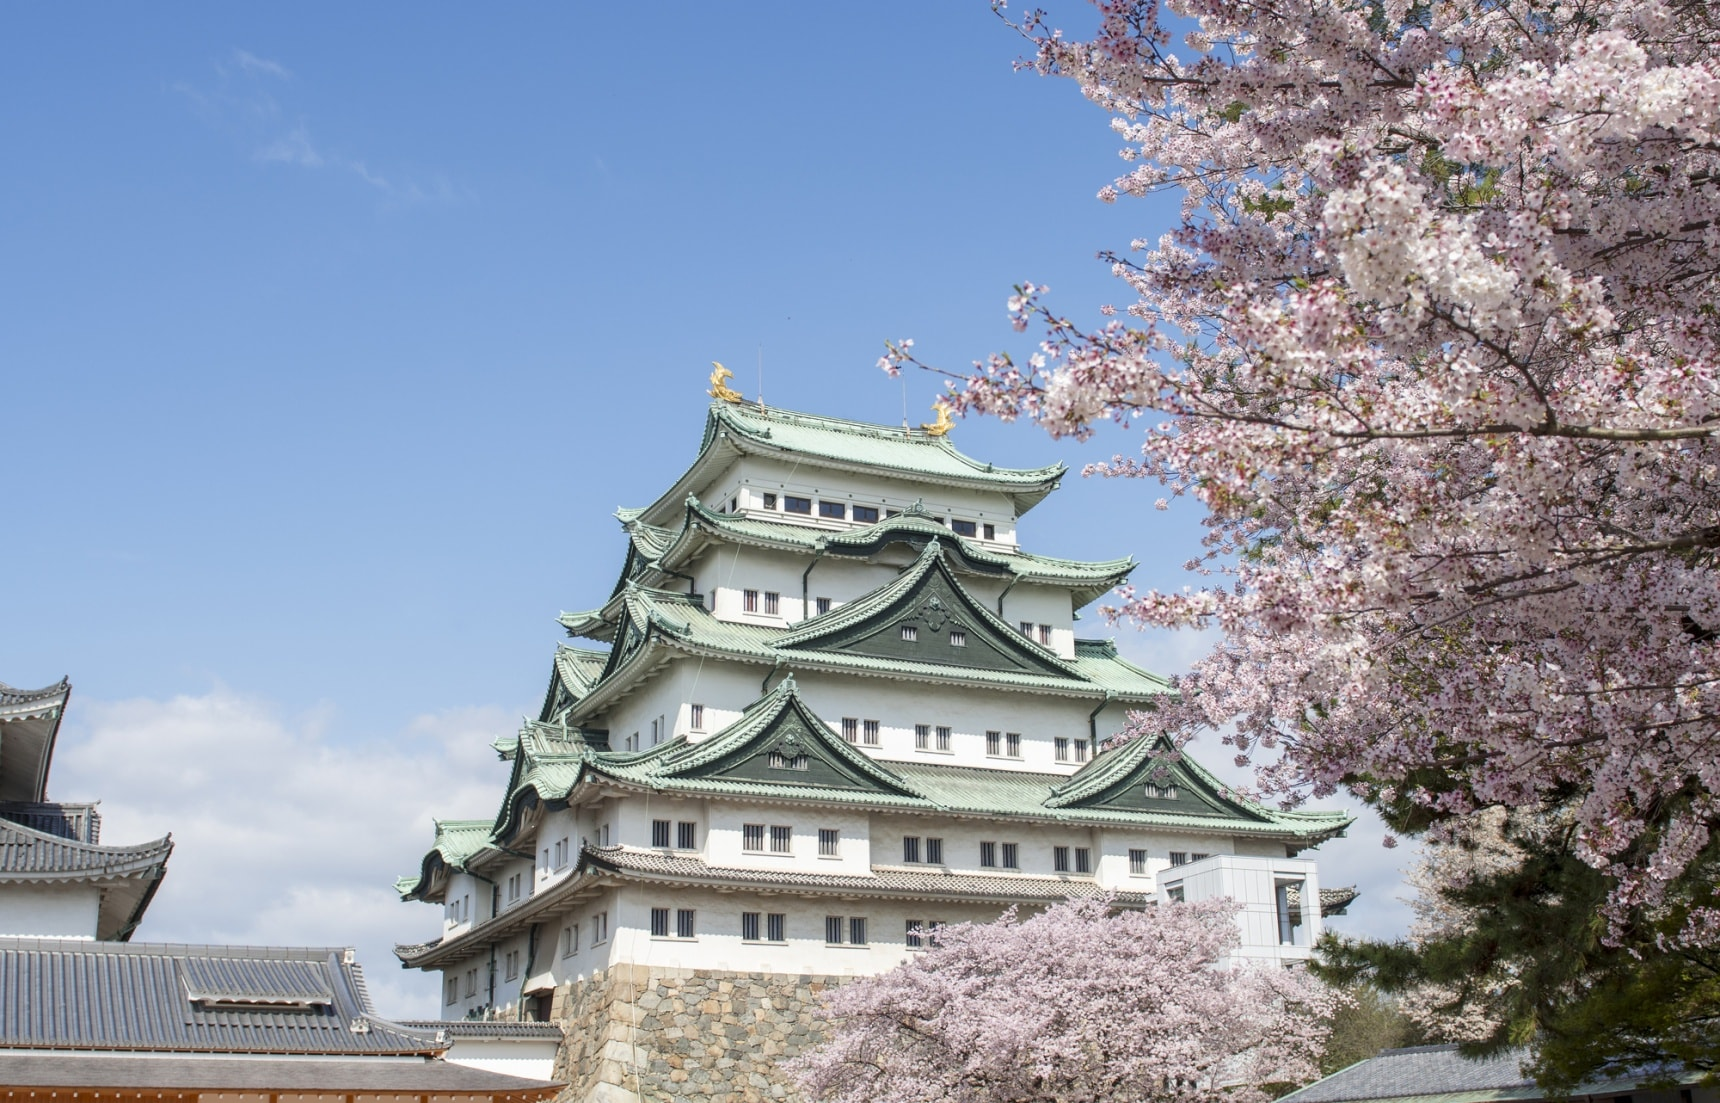 11 Photogenic Places in Nagoya